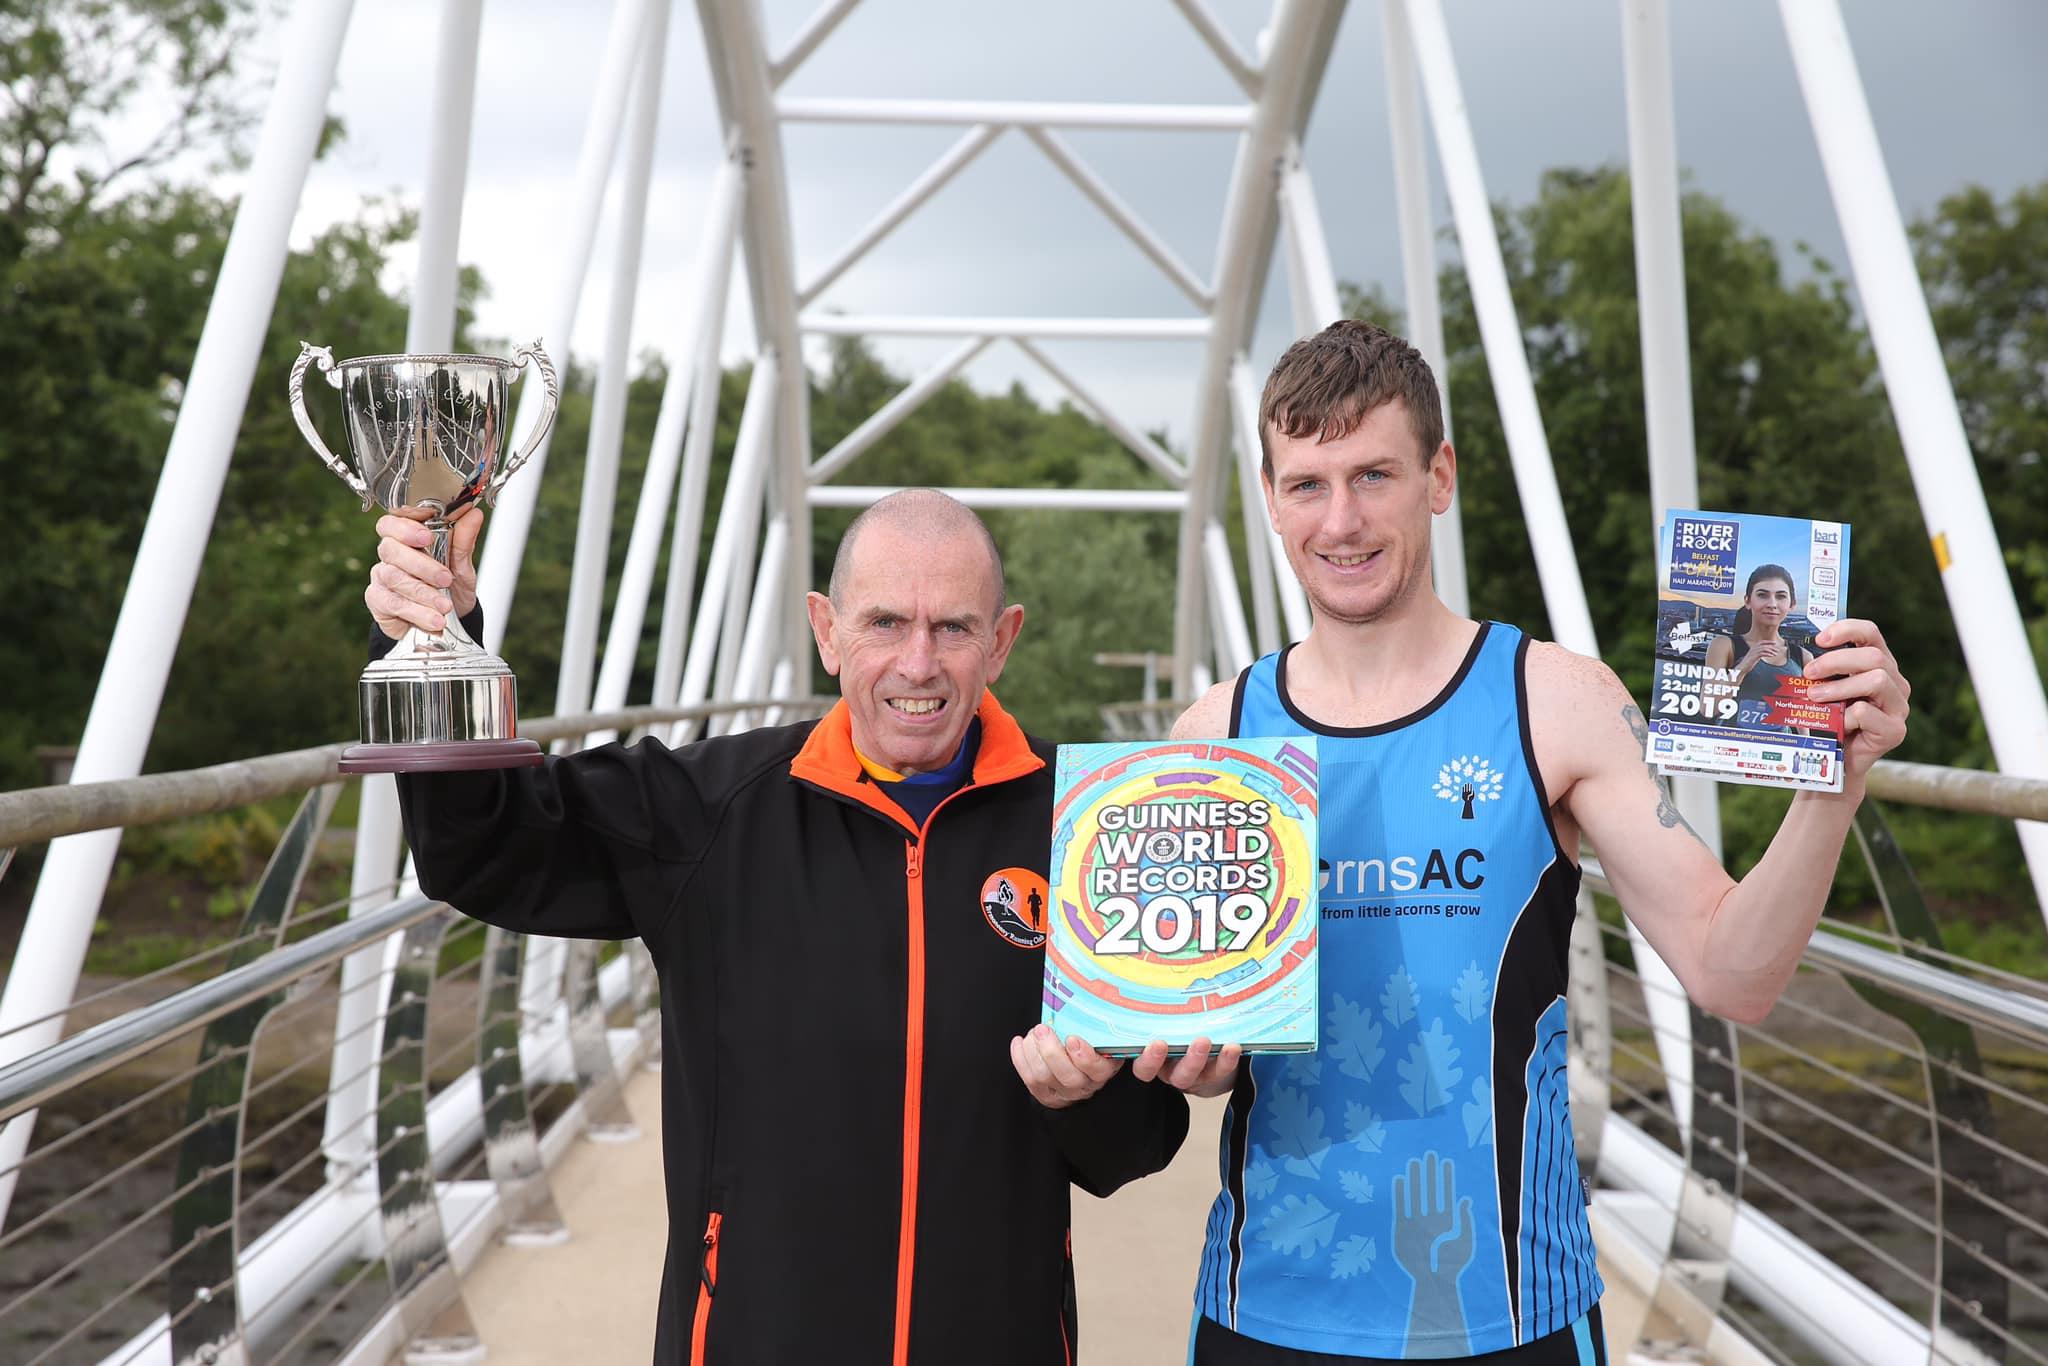 Award Winning Father and Son set for World Record at September Belfast City Half Marathon